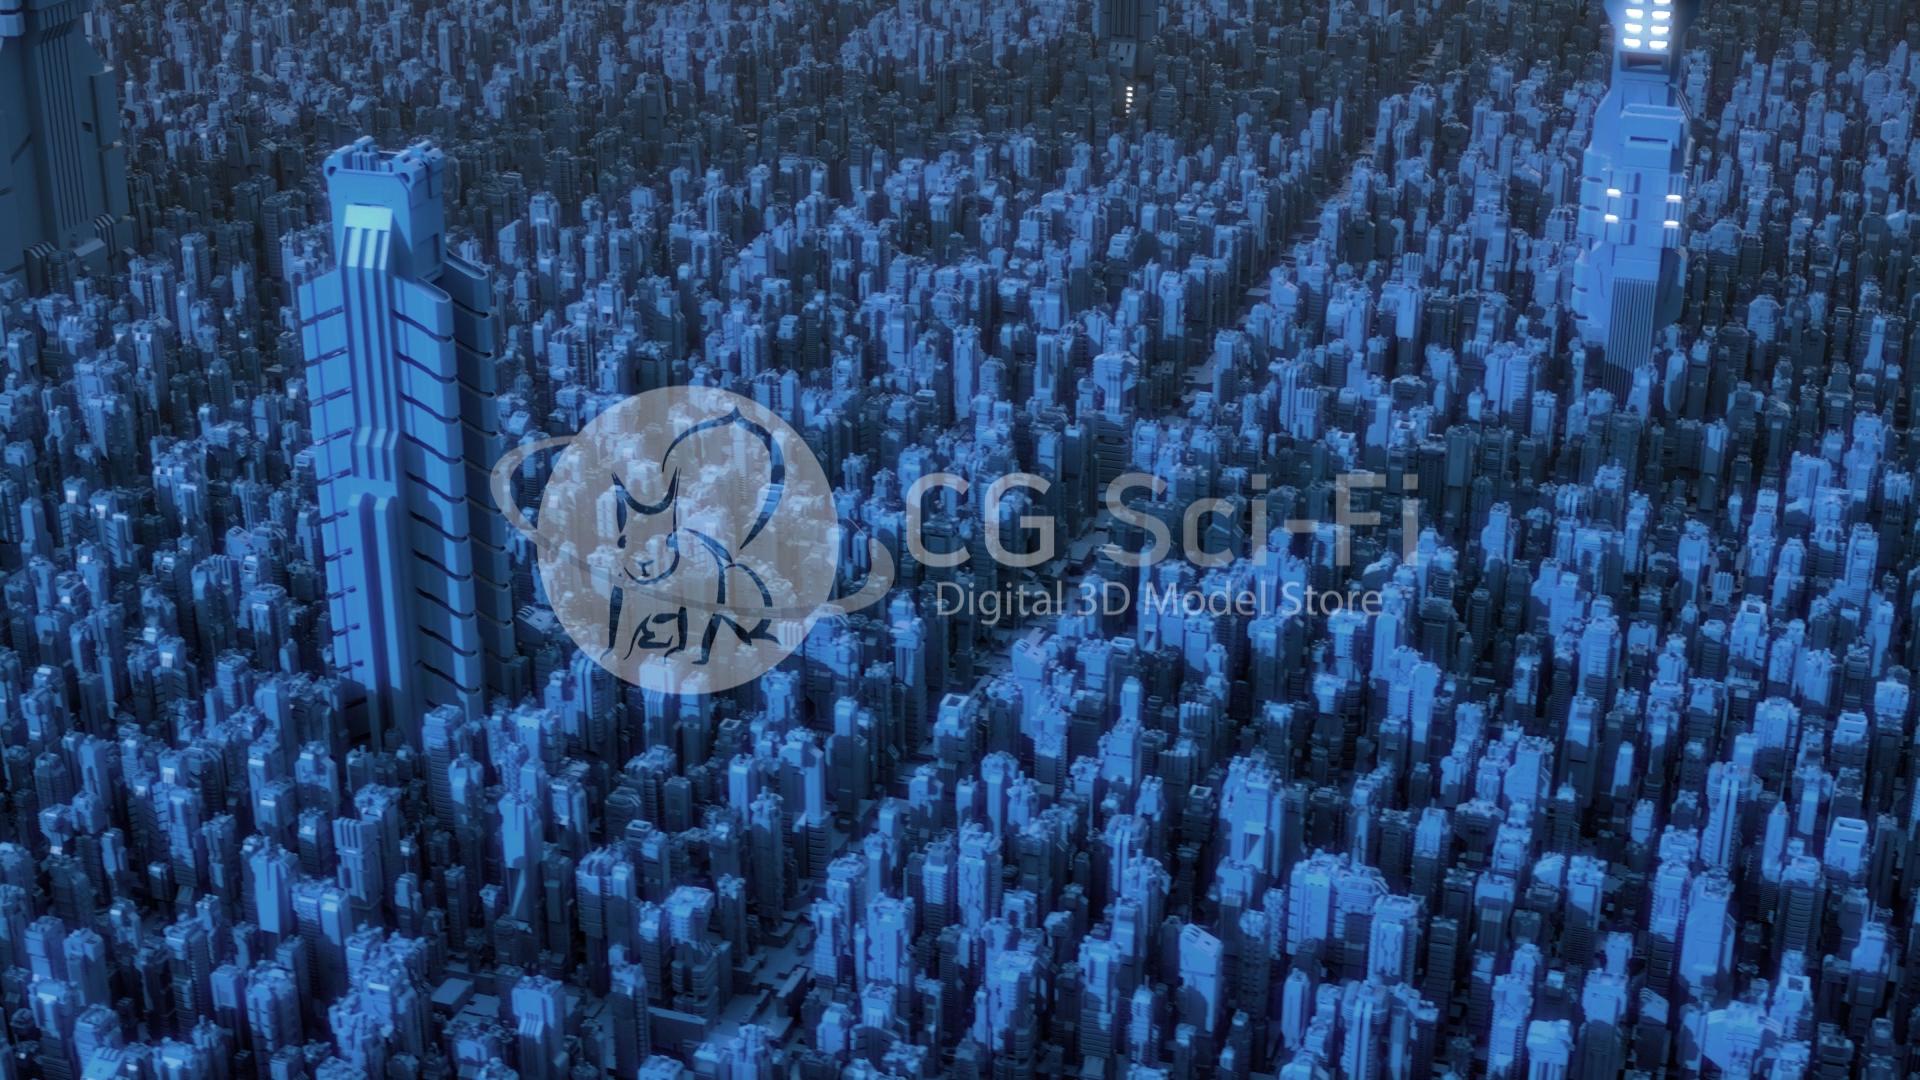 A flyover of a Sci-Fi futuristic cityscape with huge